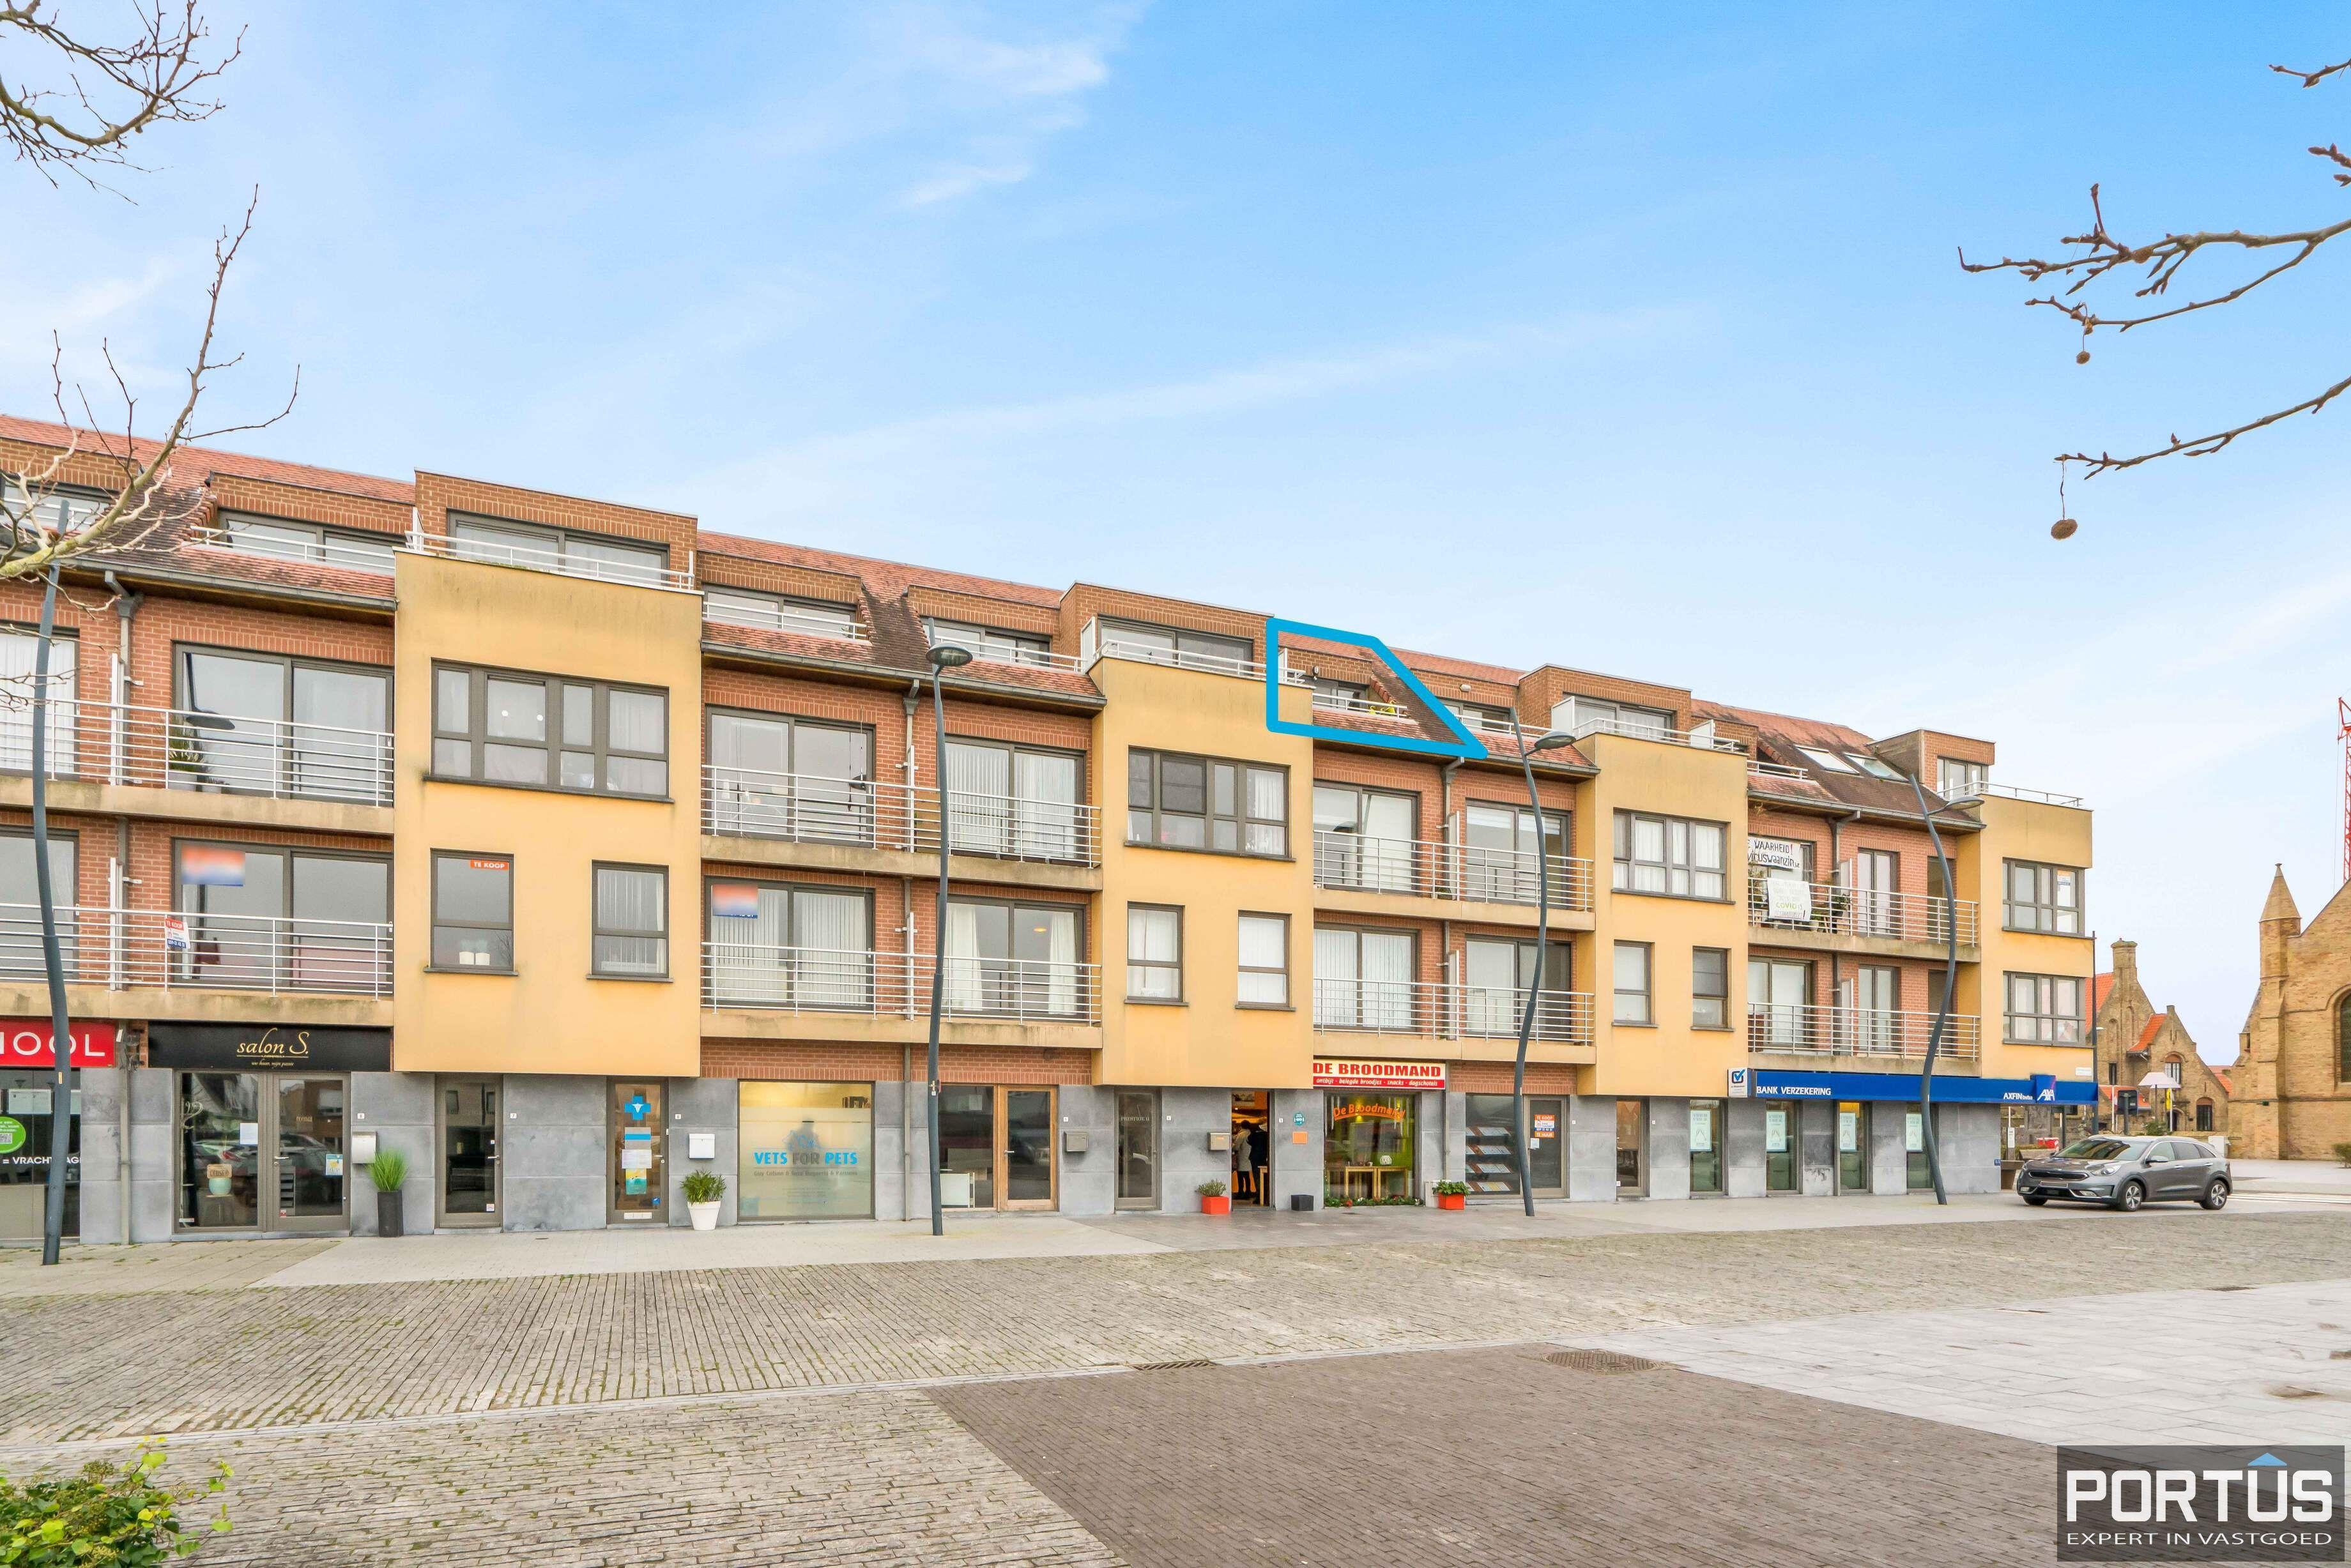 Instapklaar appartement met 1 slaapkamer te koop te Westende - 12050